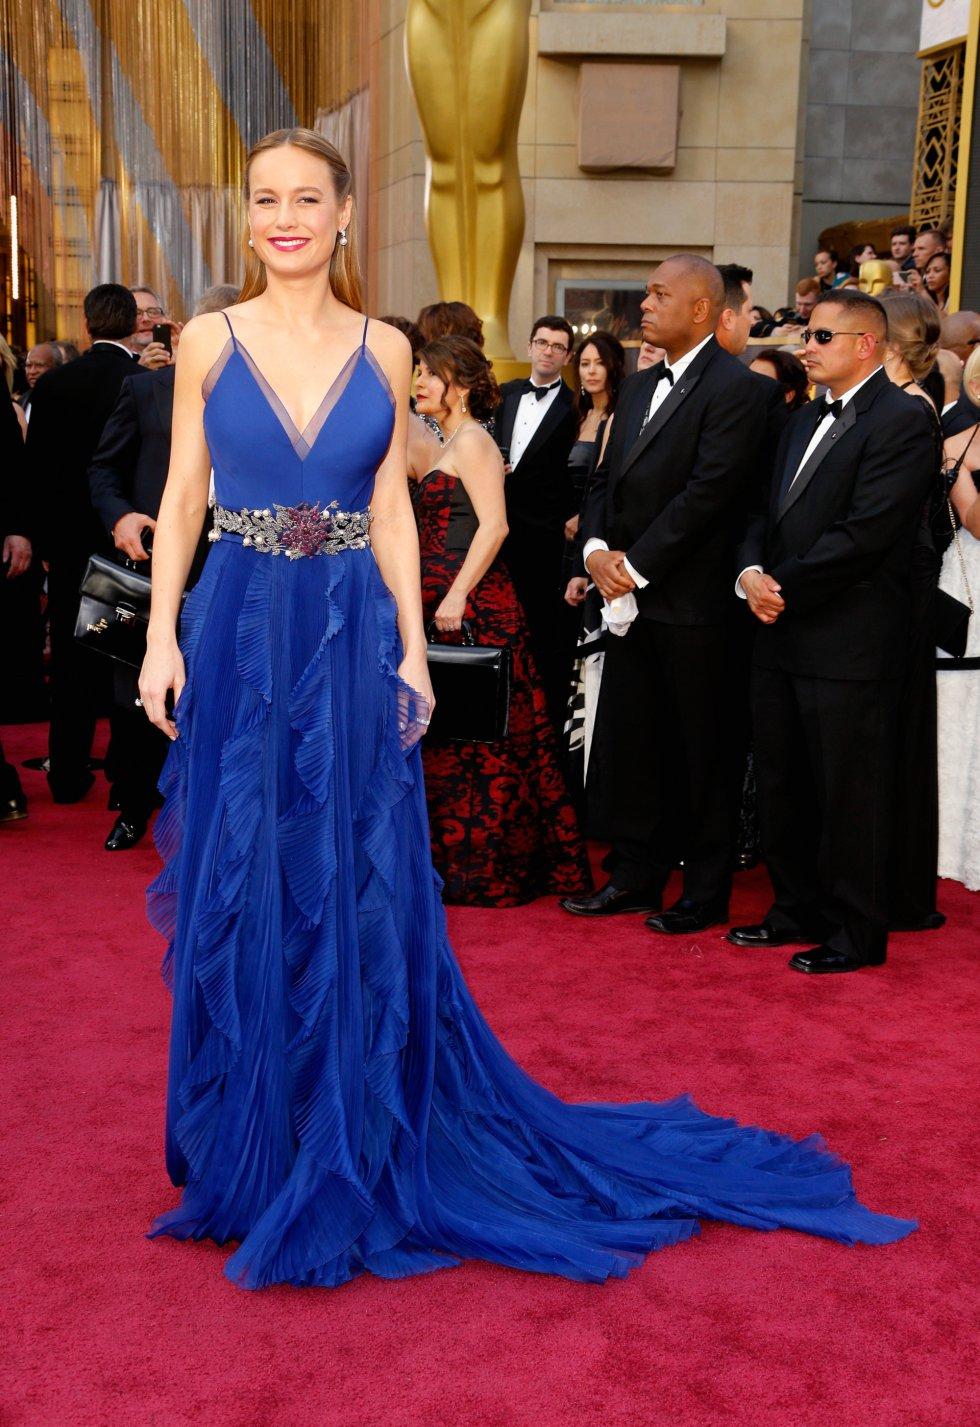 La actriz Brie Larson